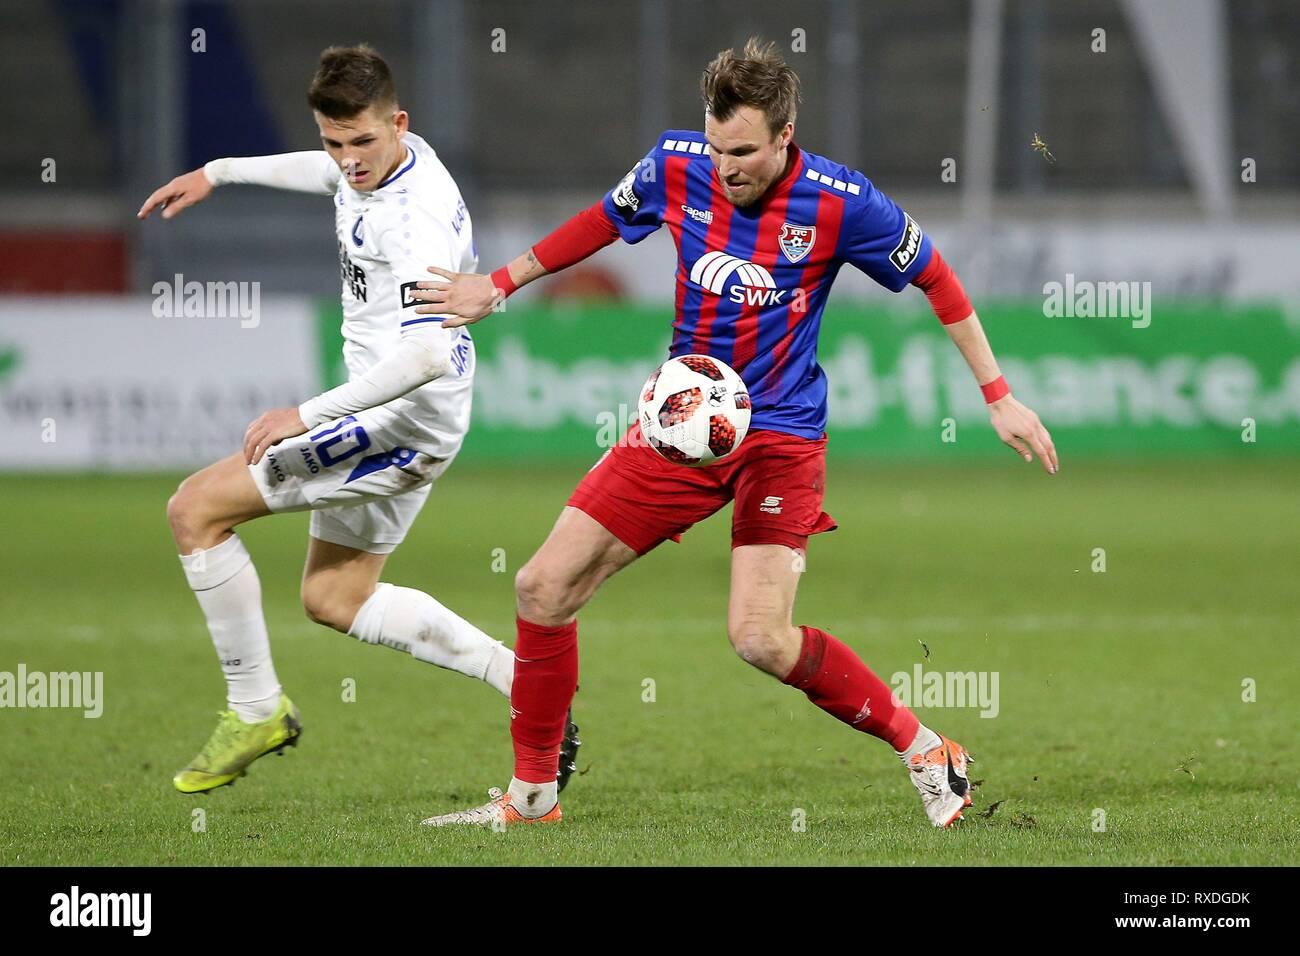 firo: 08.03.2019 Football, 3. Bundesliga, season 2018/2019 KFC Uerdingen 05 - Karlsruher SC Kevin Grovukreutz (# 6, KFC Uerdingen 05) in duels with Marvin Wanitzek (# 10, Karlsruher SC) | usage worldwide - Stock Image